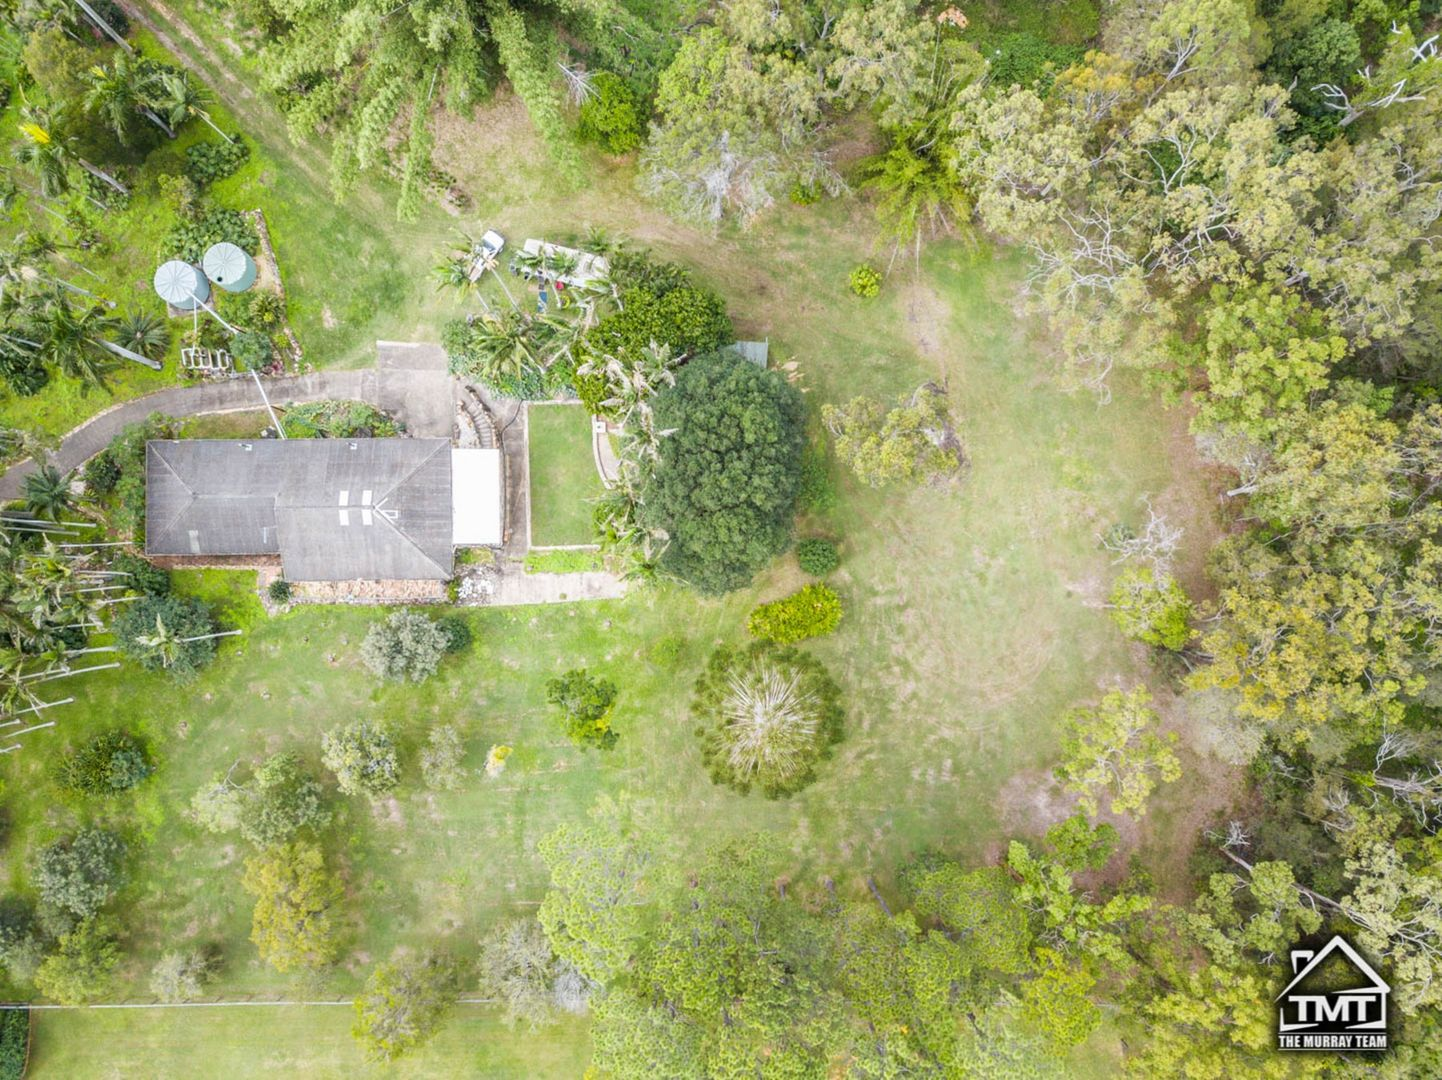 515 London Road, Chandler QLD 4155, Image 1